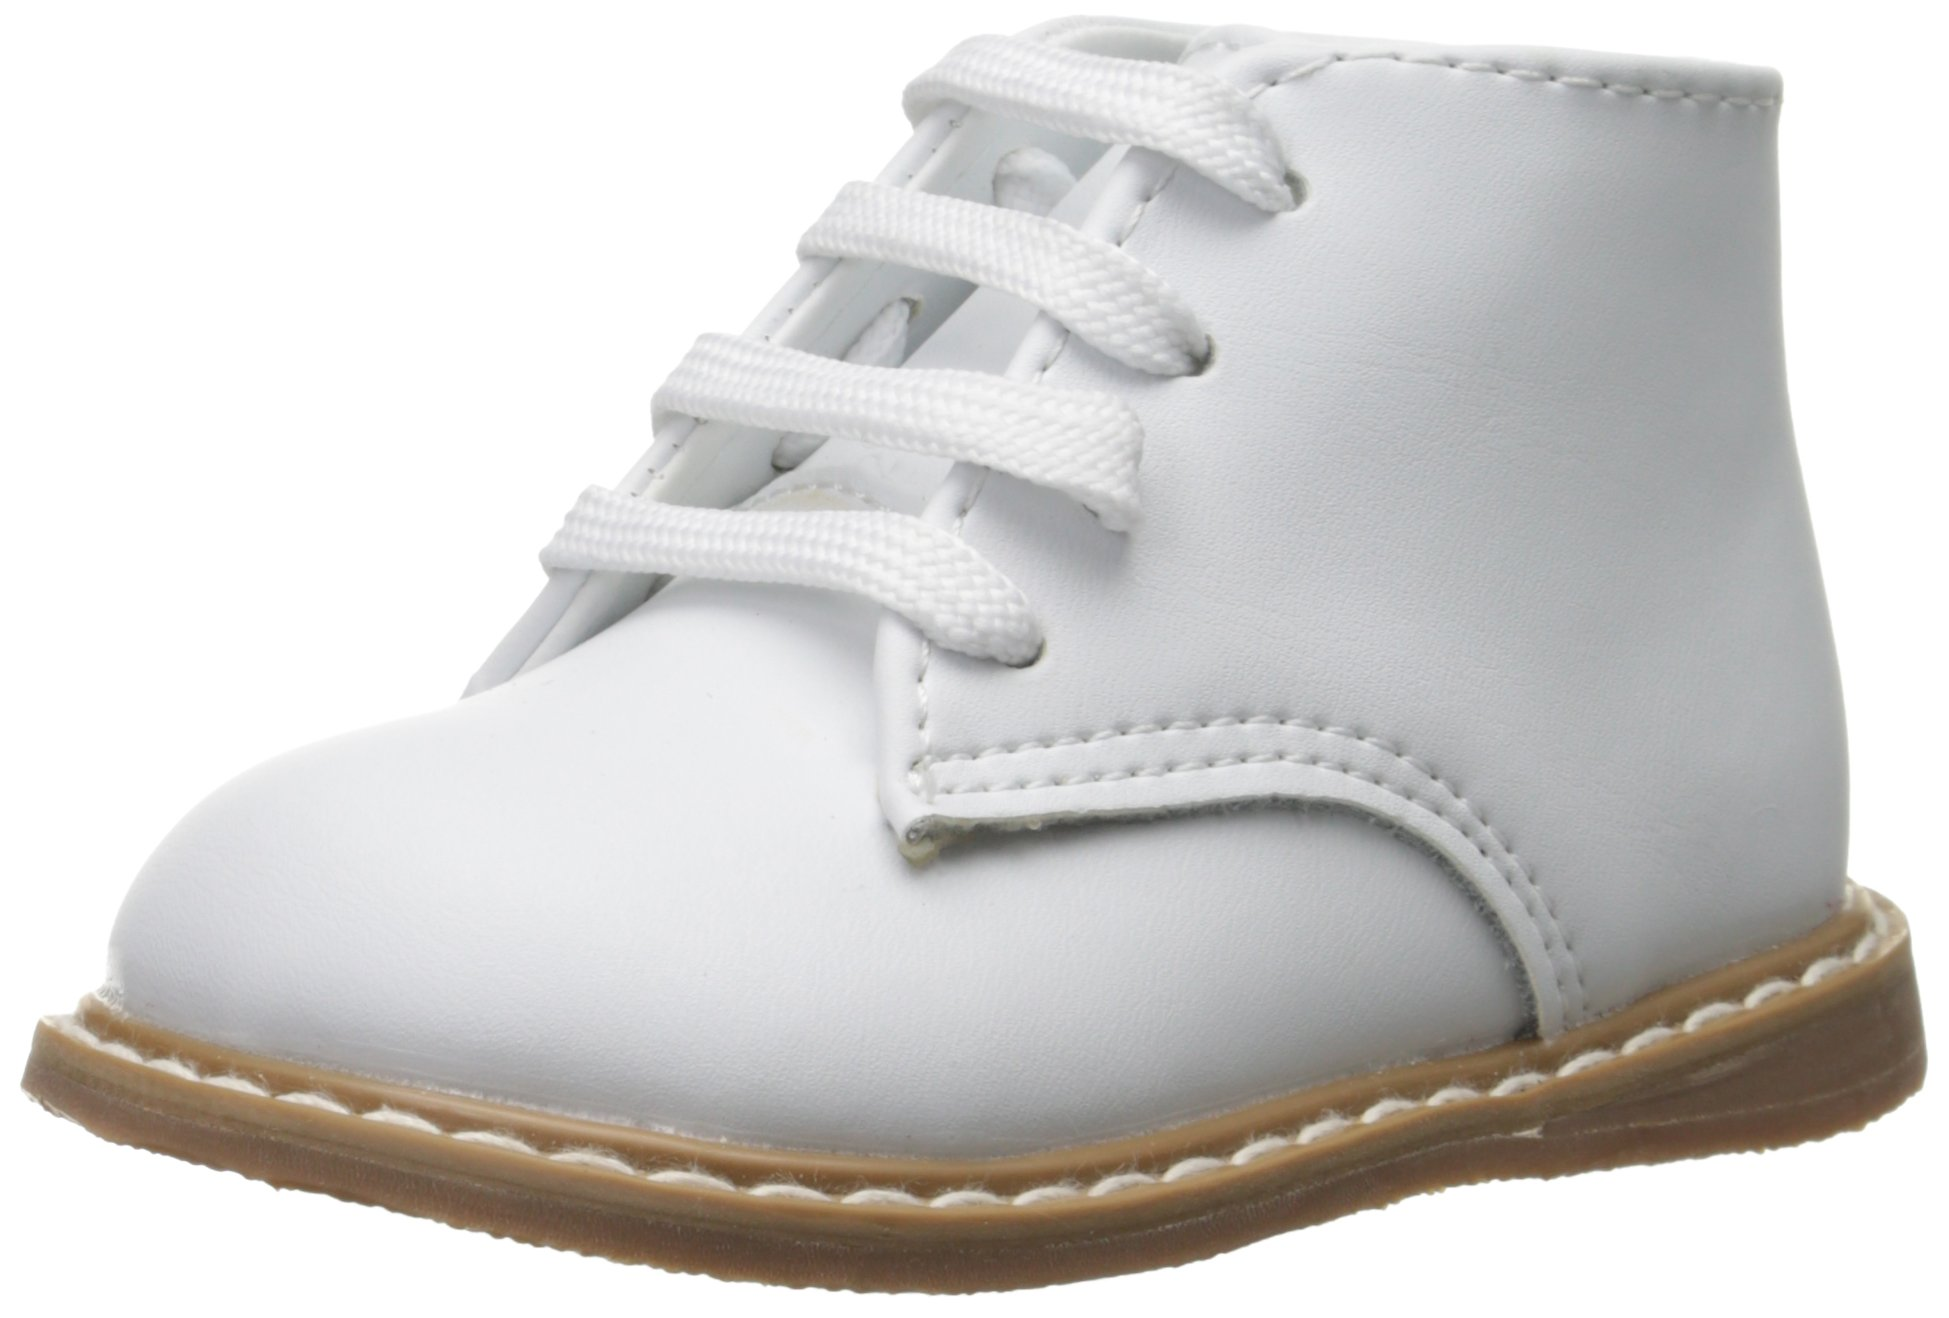 Baby Deer High Top Leather First Walker (Infant/Toddler),White,3 M US Infant